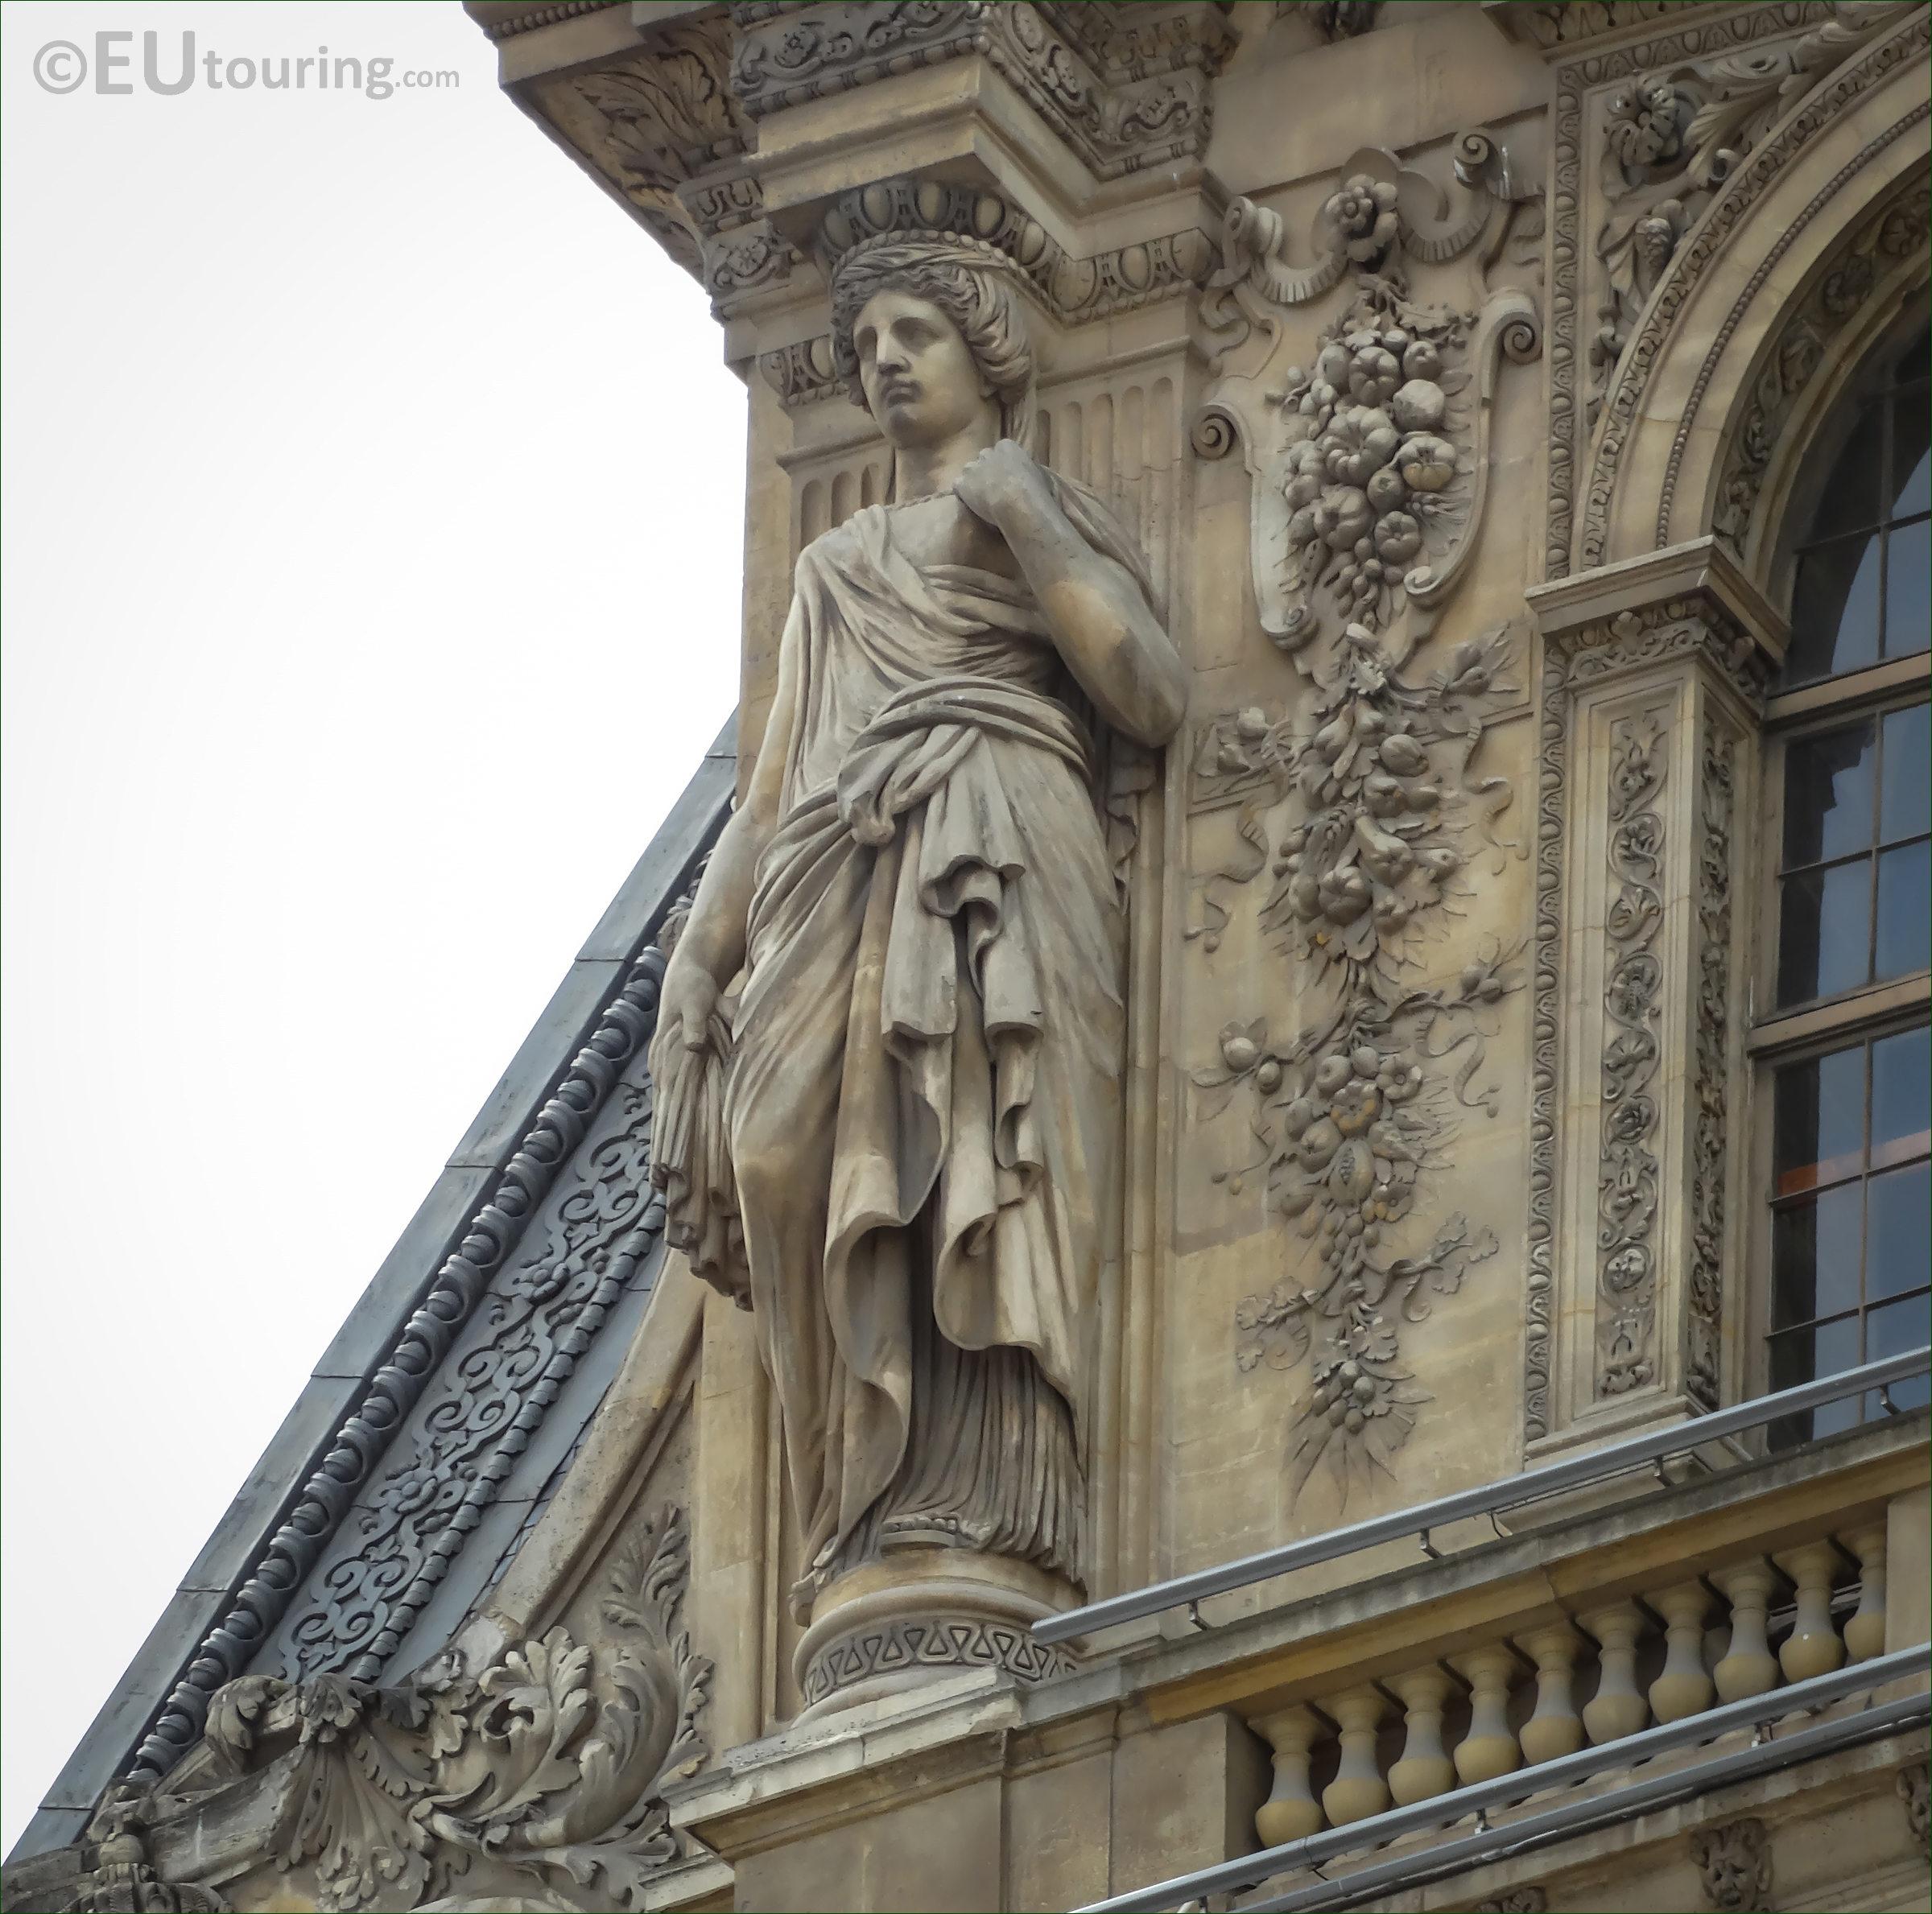 lhs caryatid sculpture on pavillon mollien at the louvre page 697